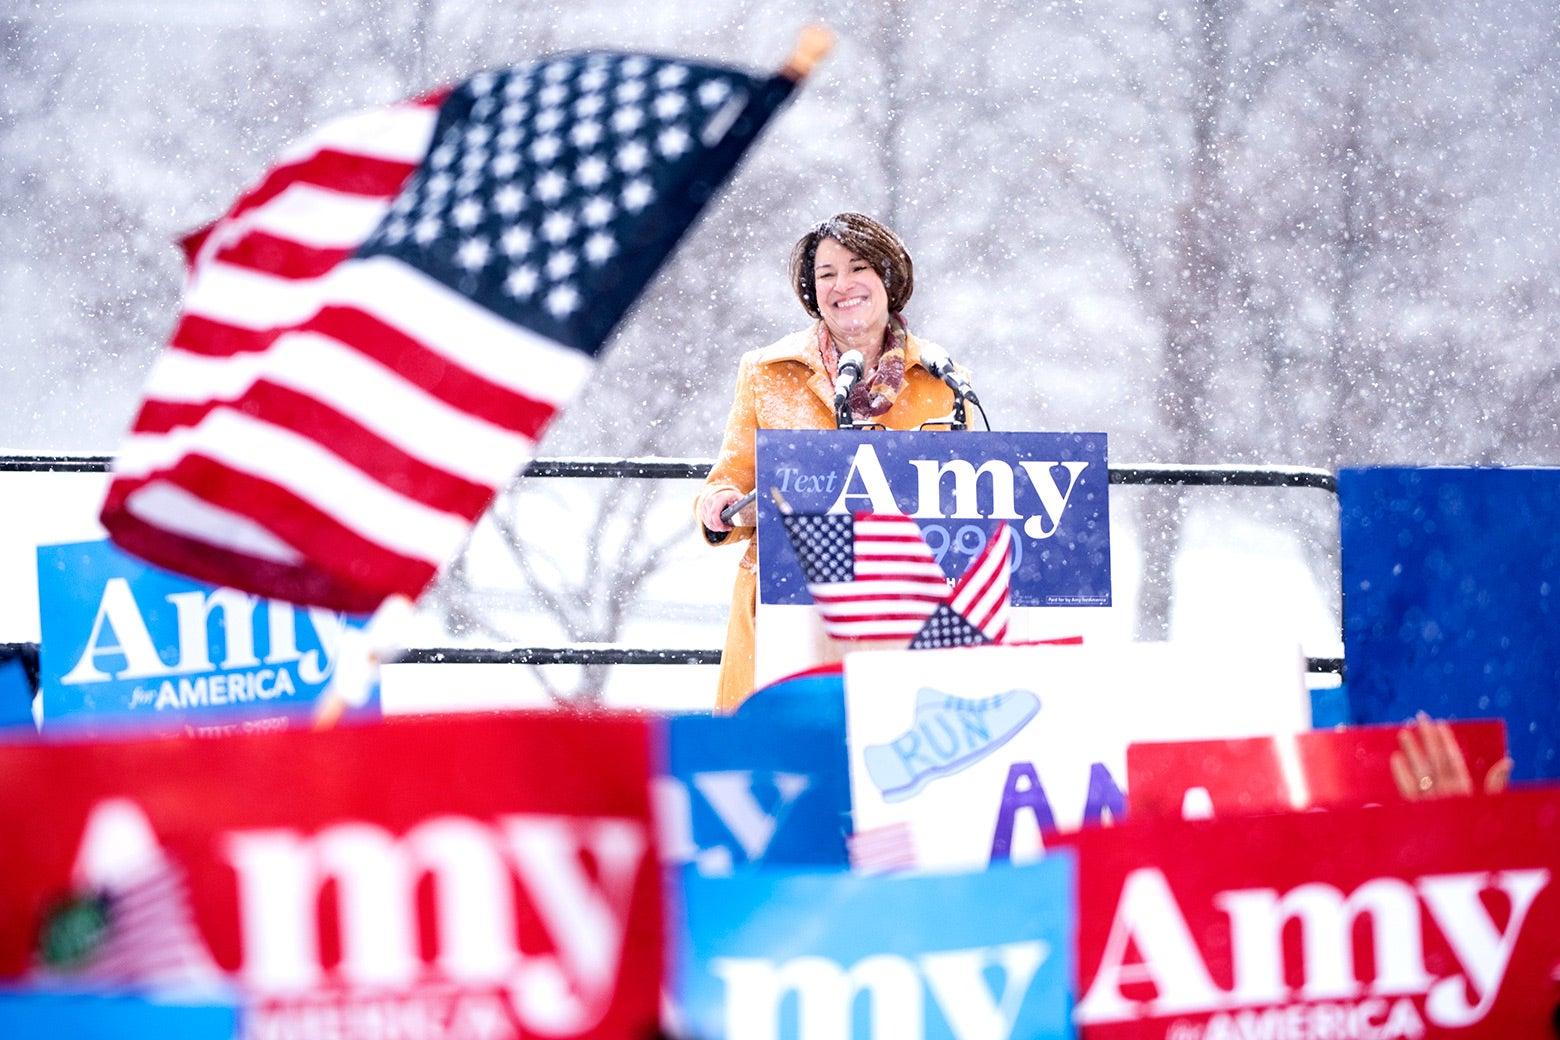 Sen. Amy Klobuchar announces her 2020 presidential bid.